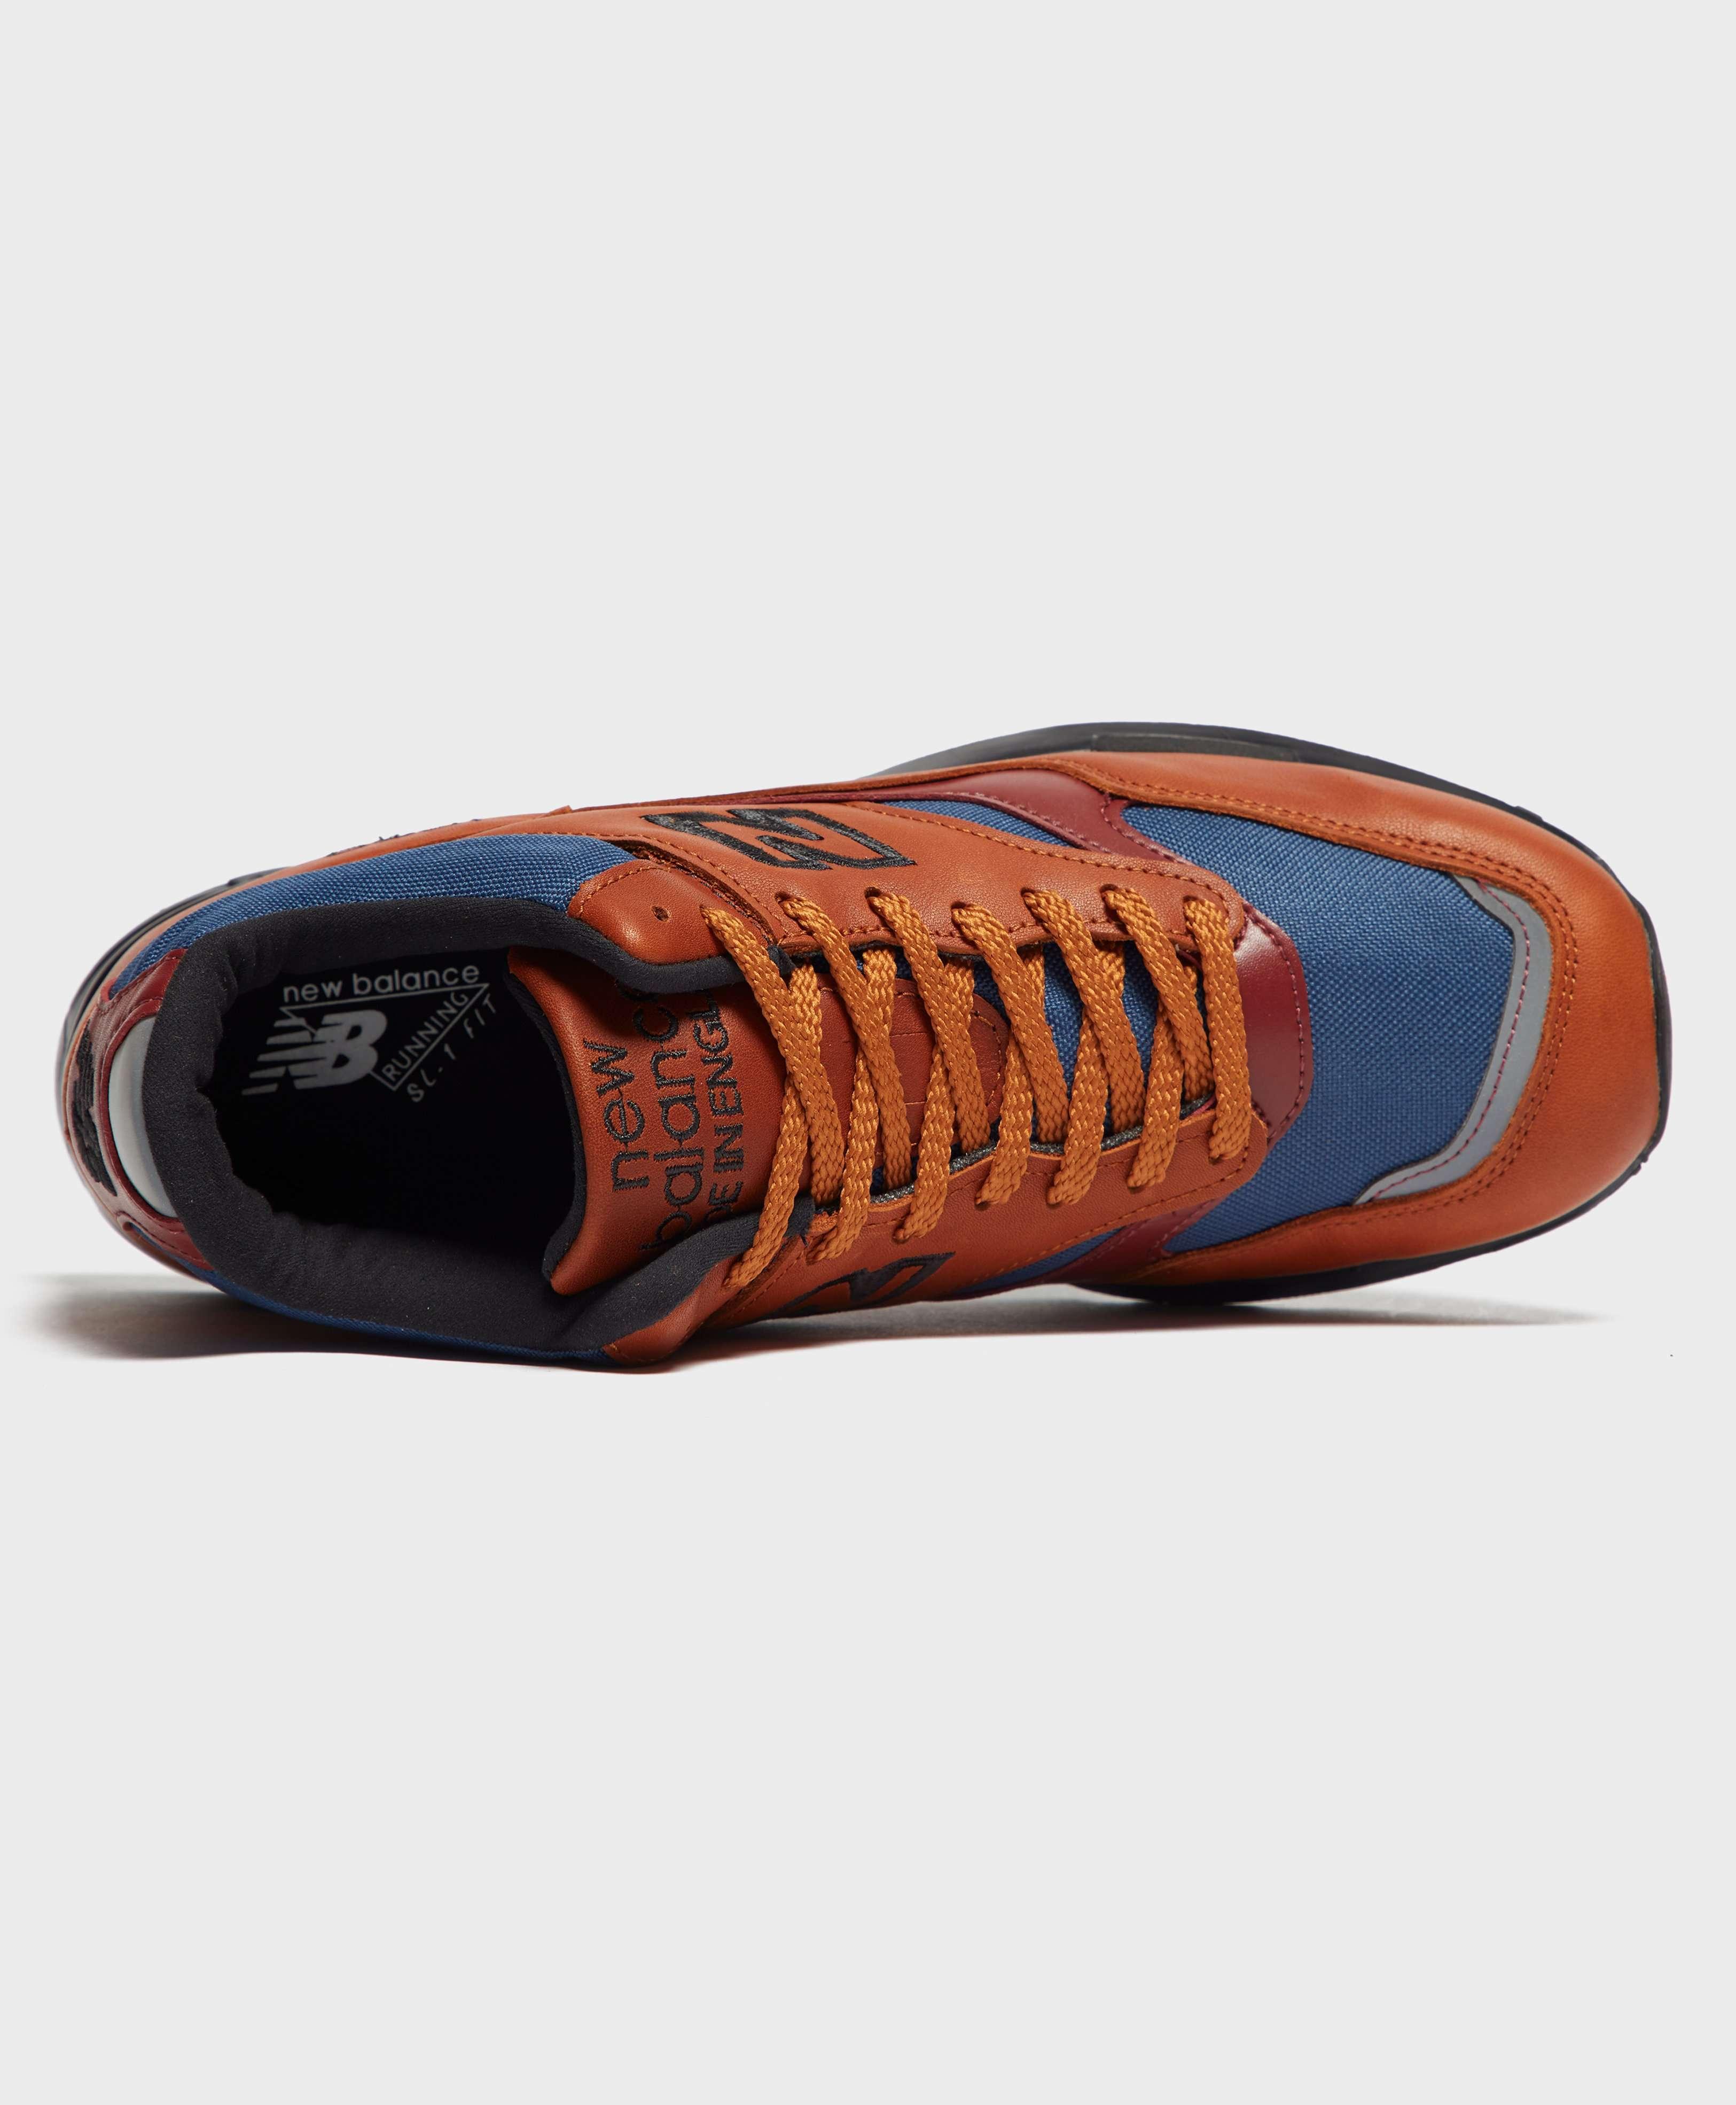 New Balance 1500 Boot